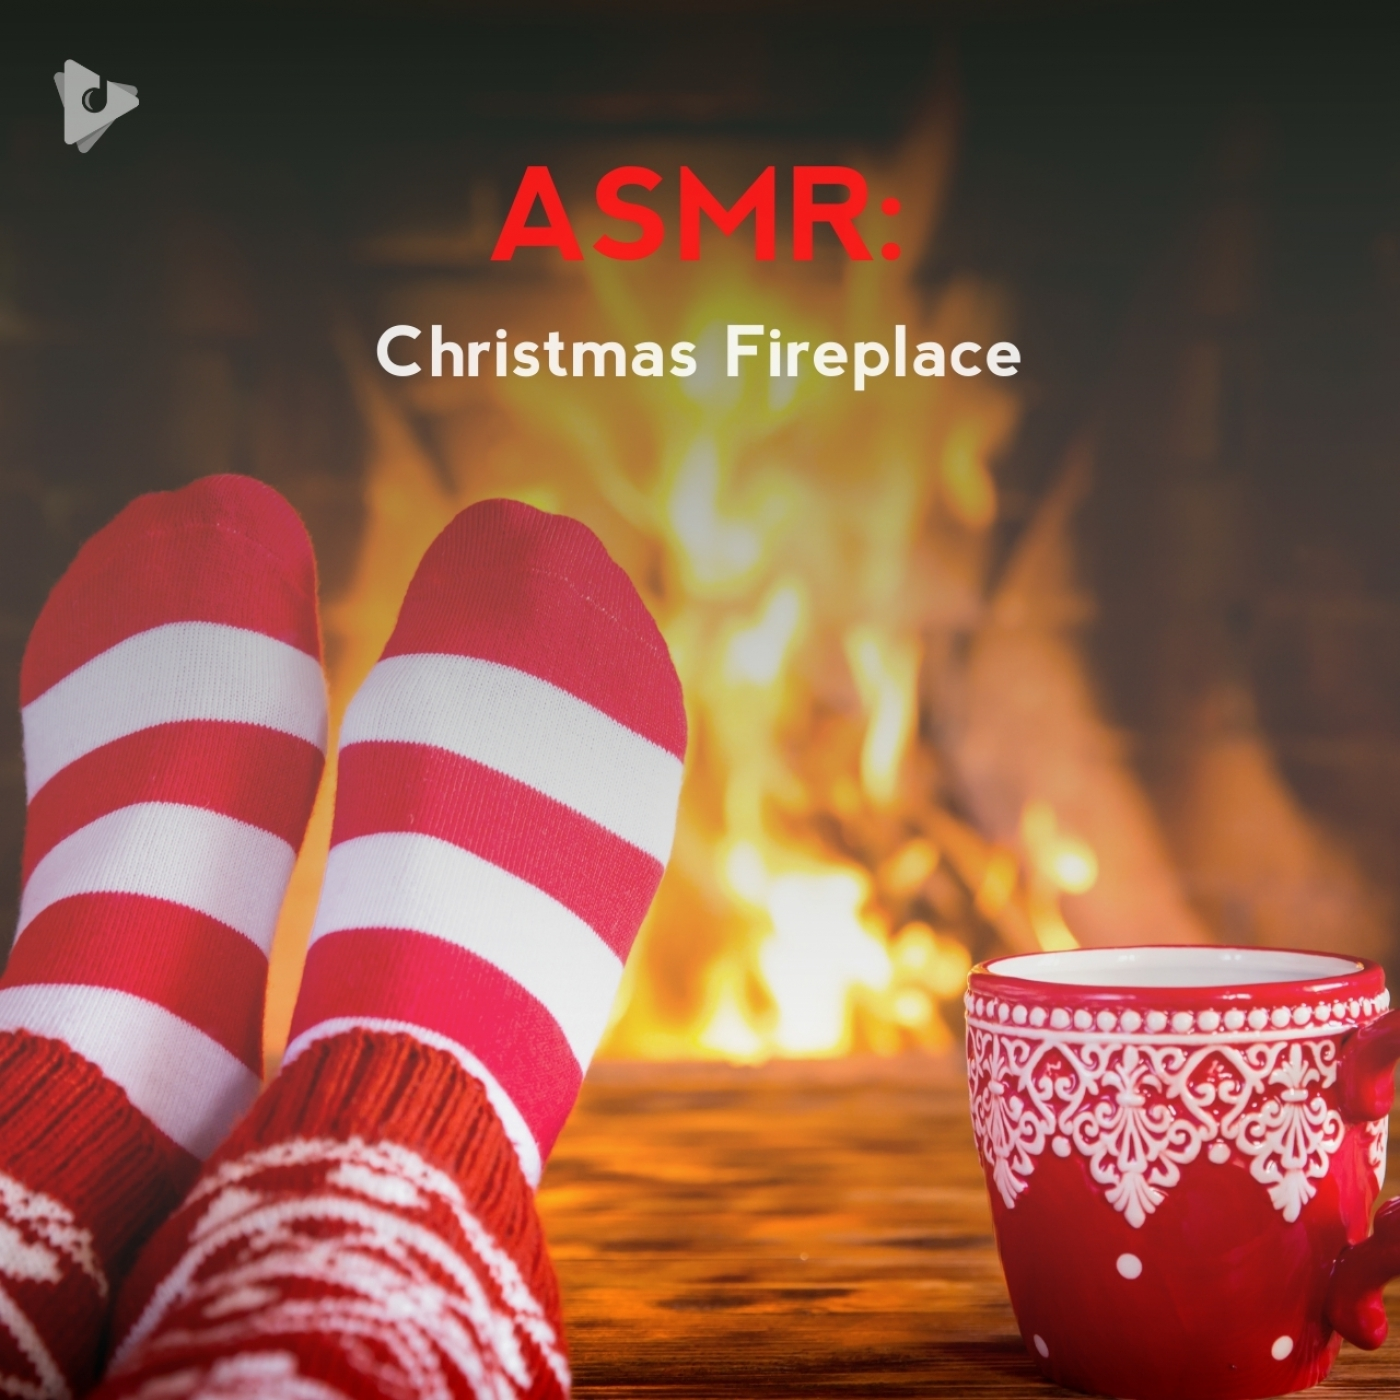 ASMR: Christmas Fireplace